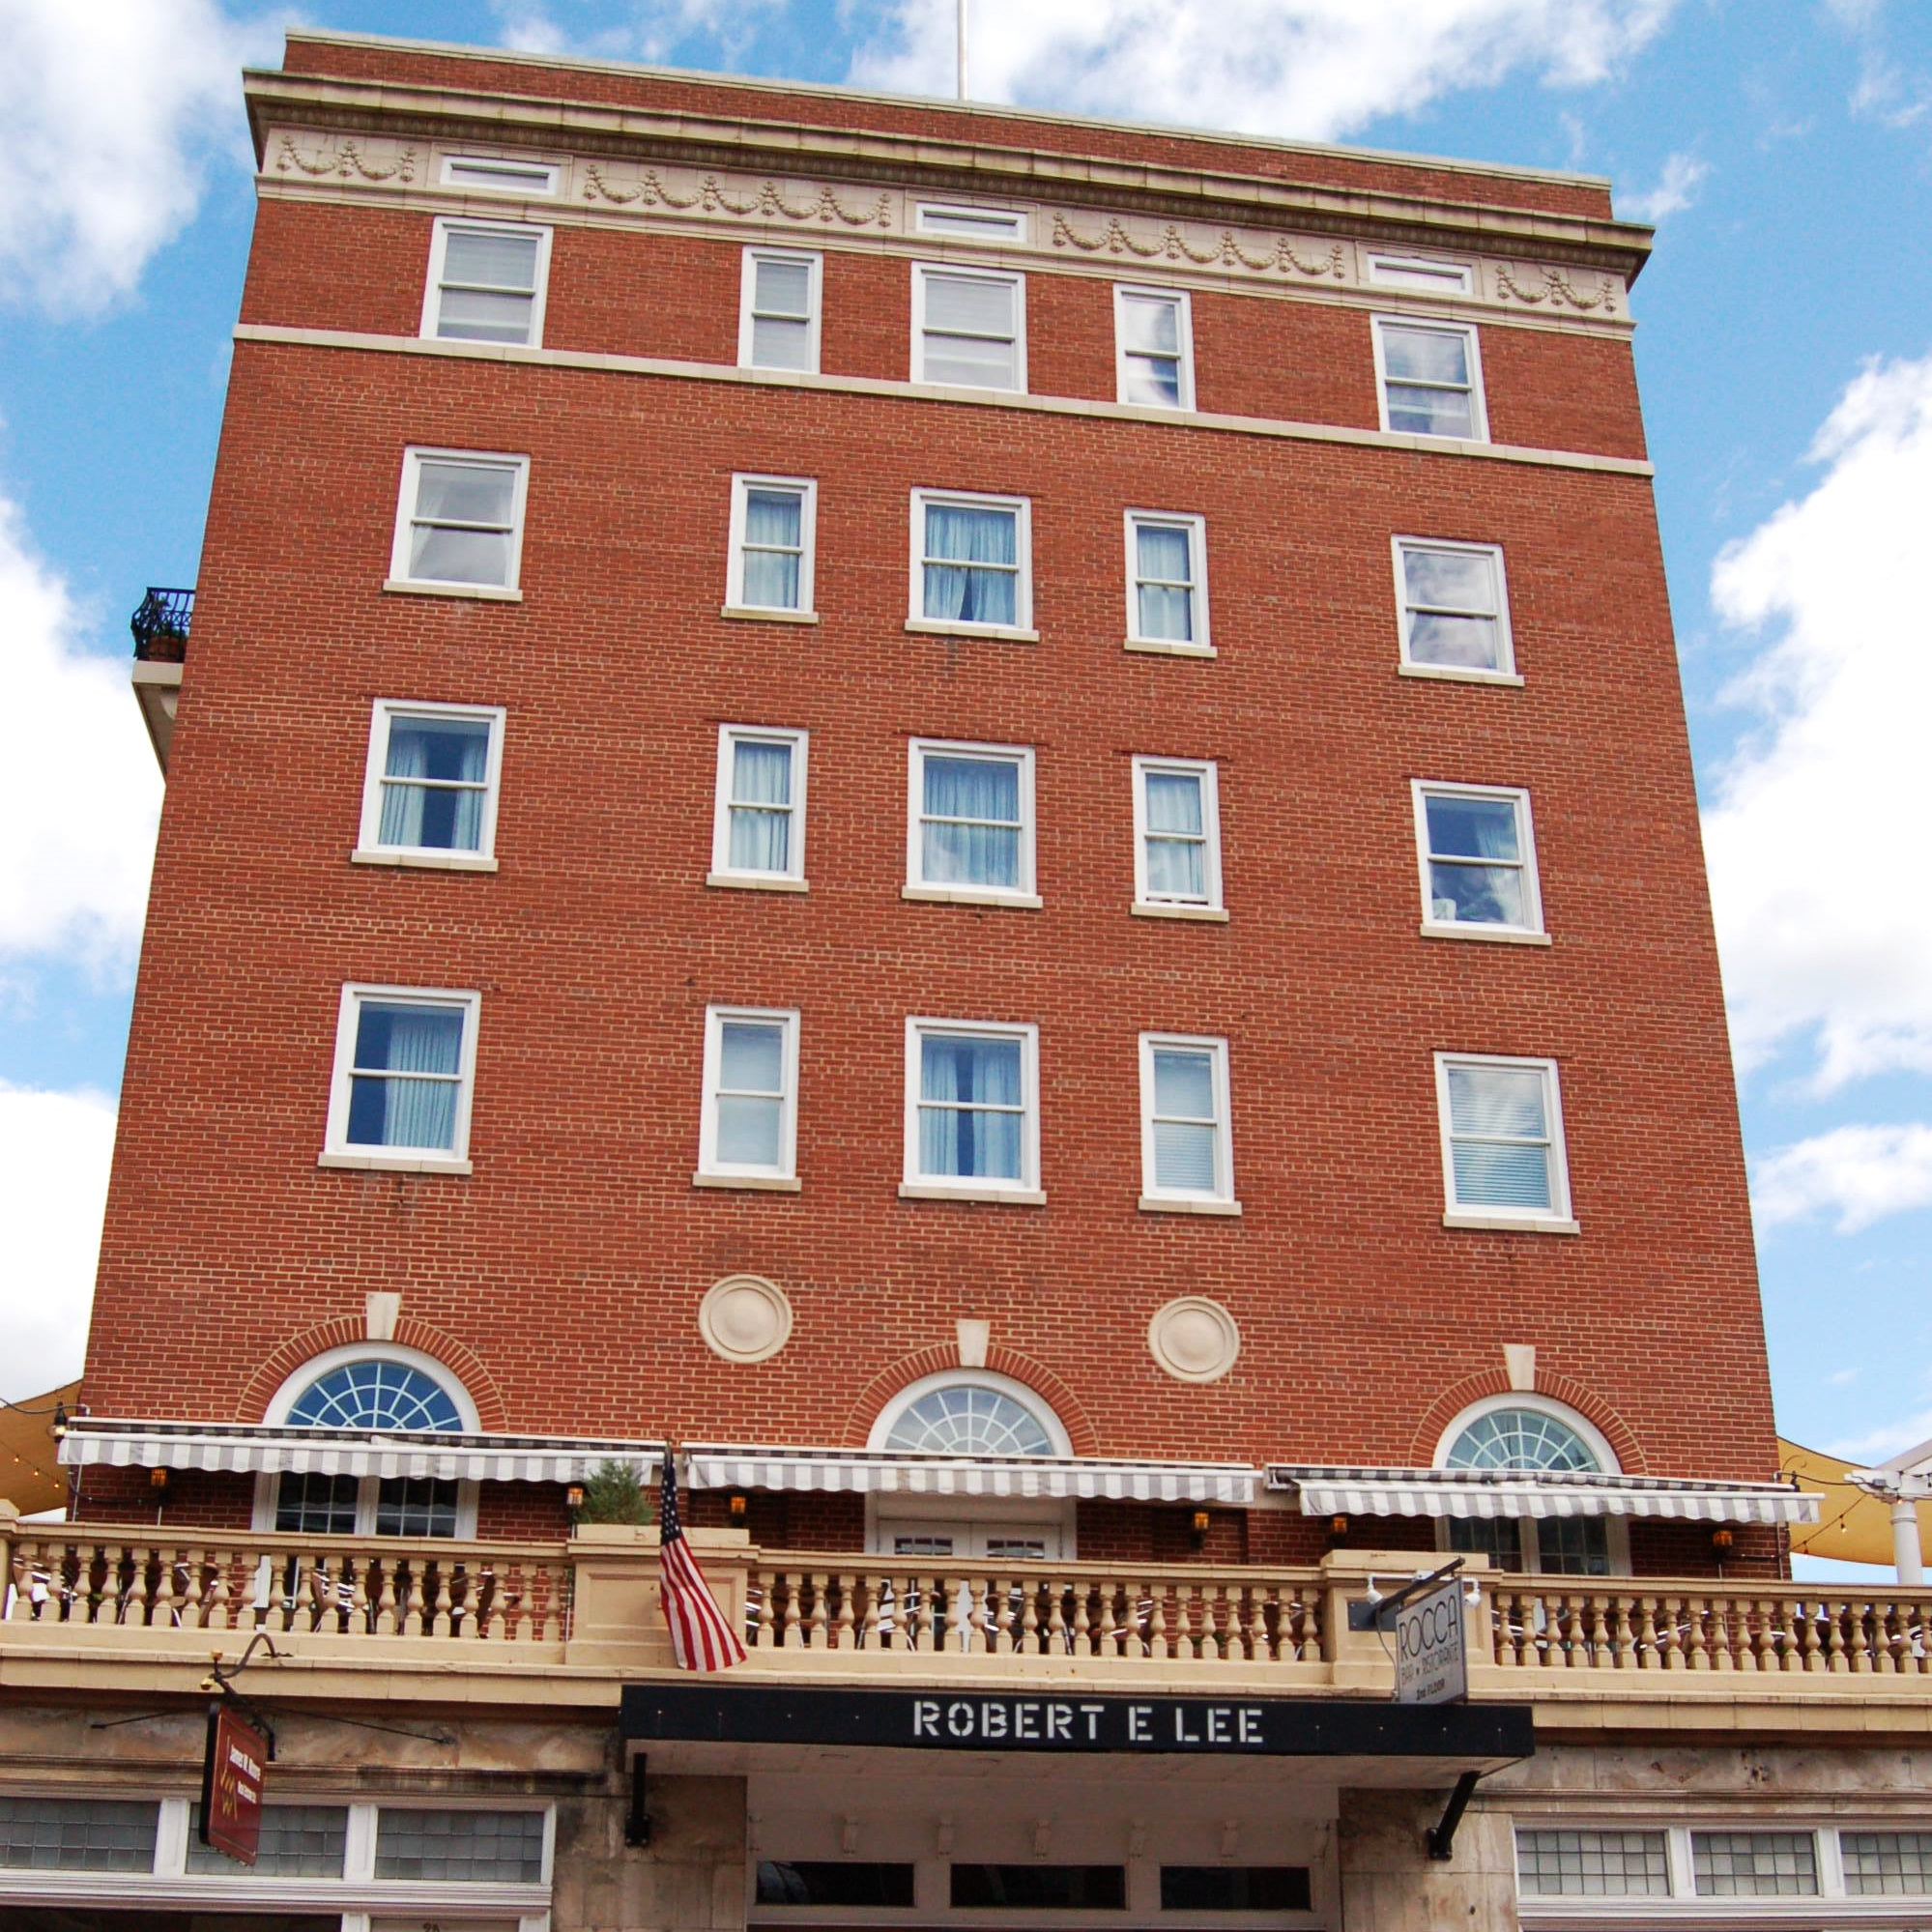 The Robert E. Lee Hotel on Main Street.